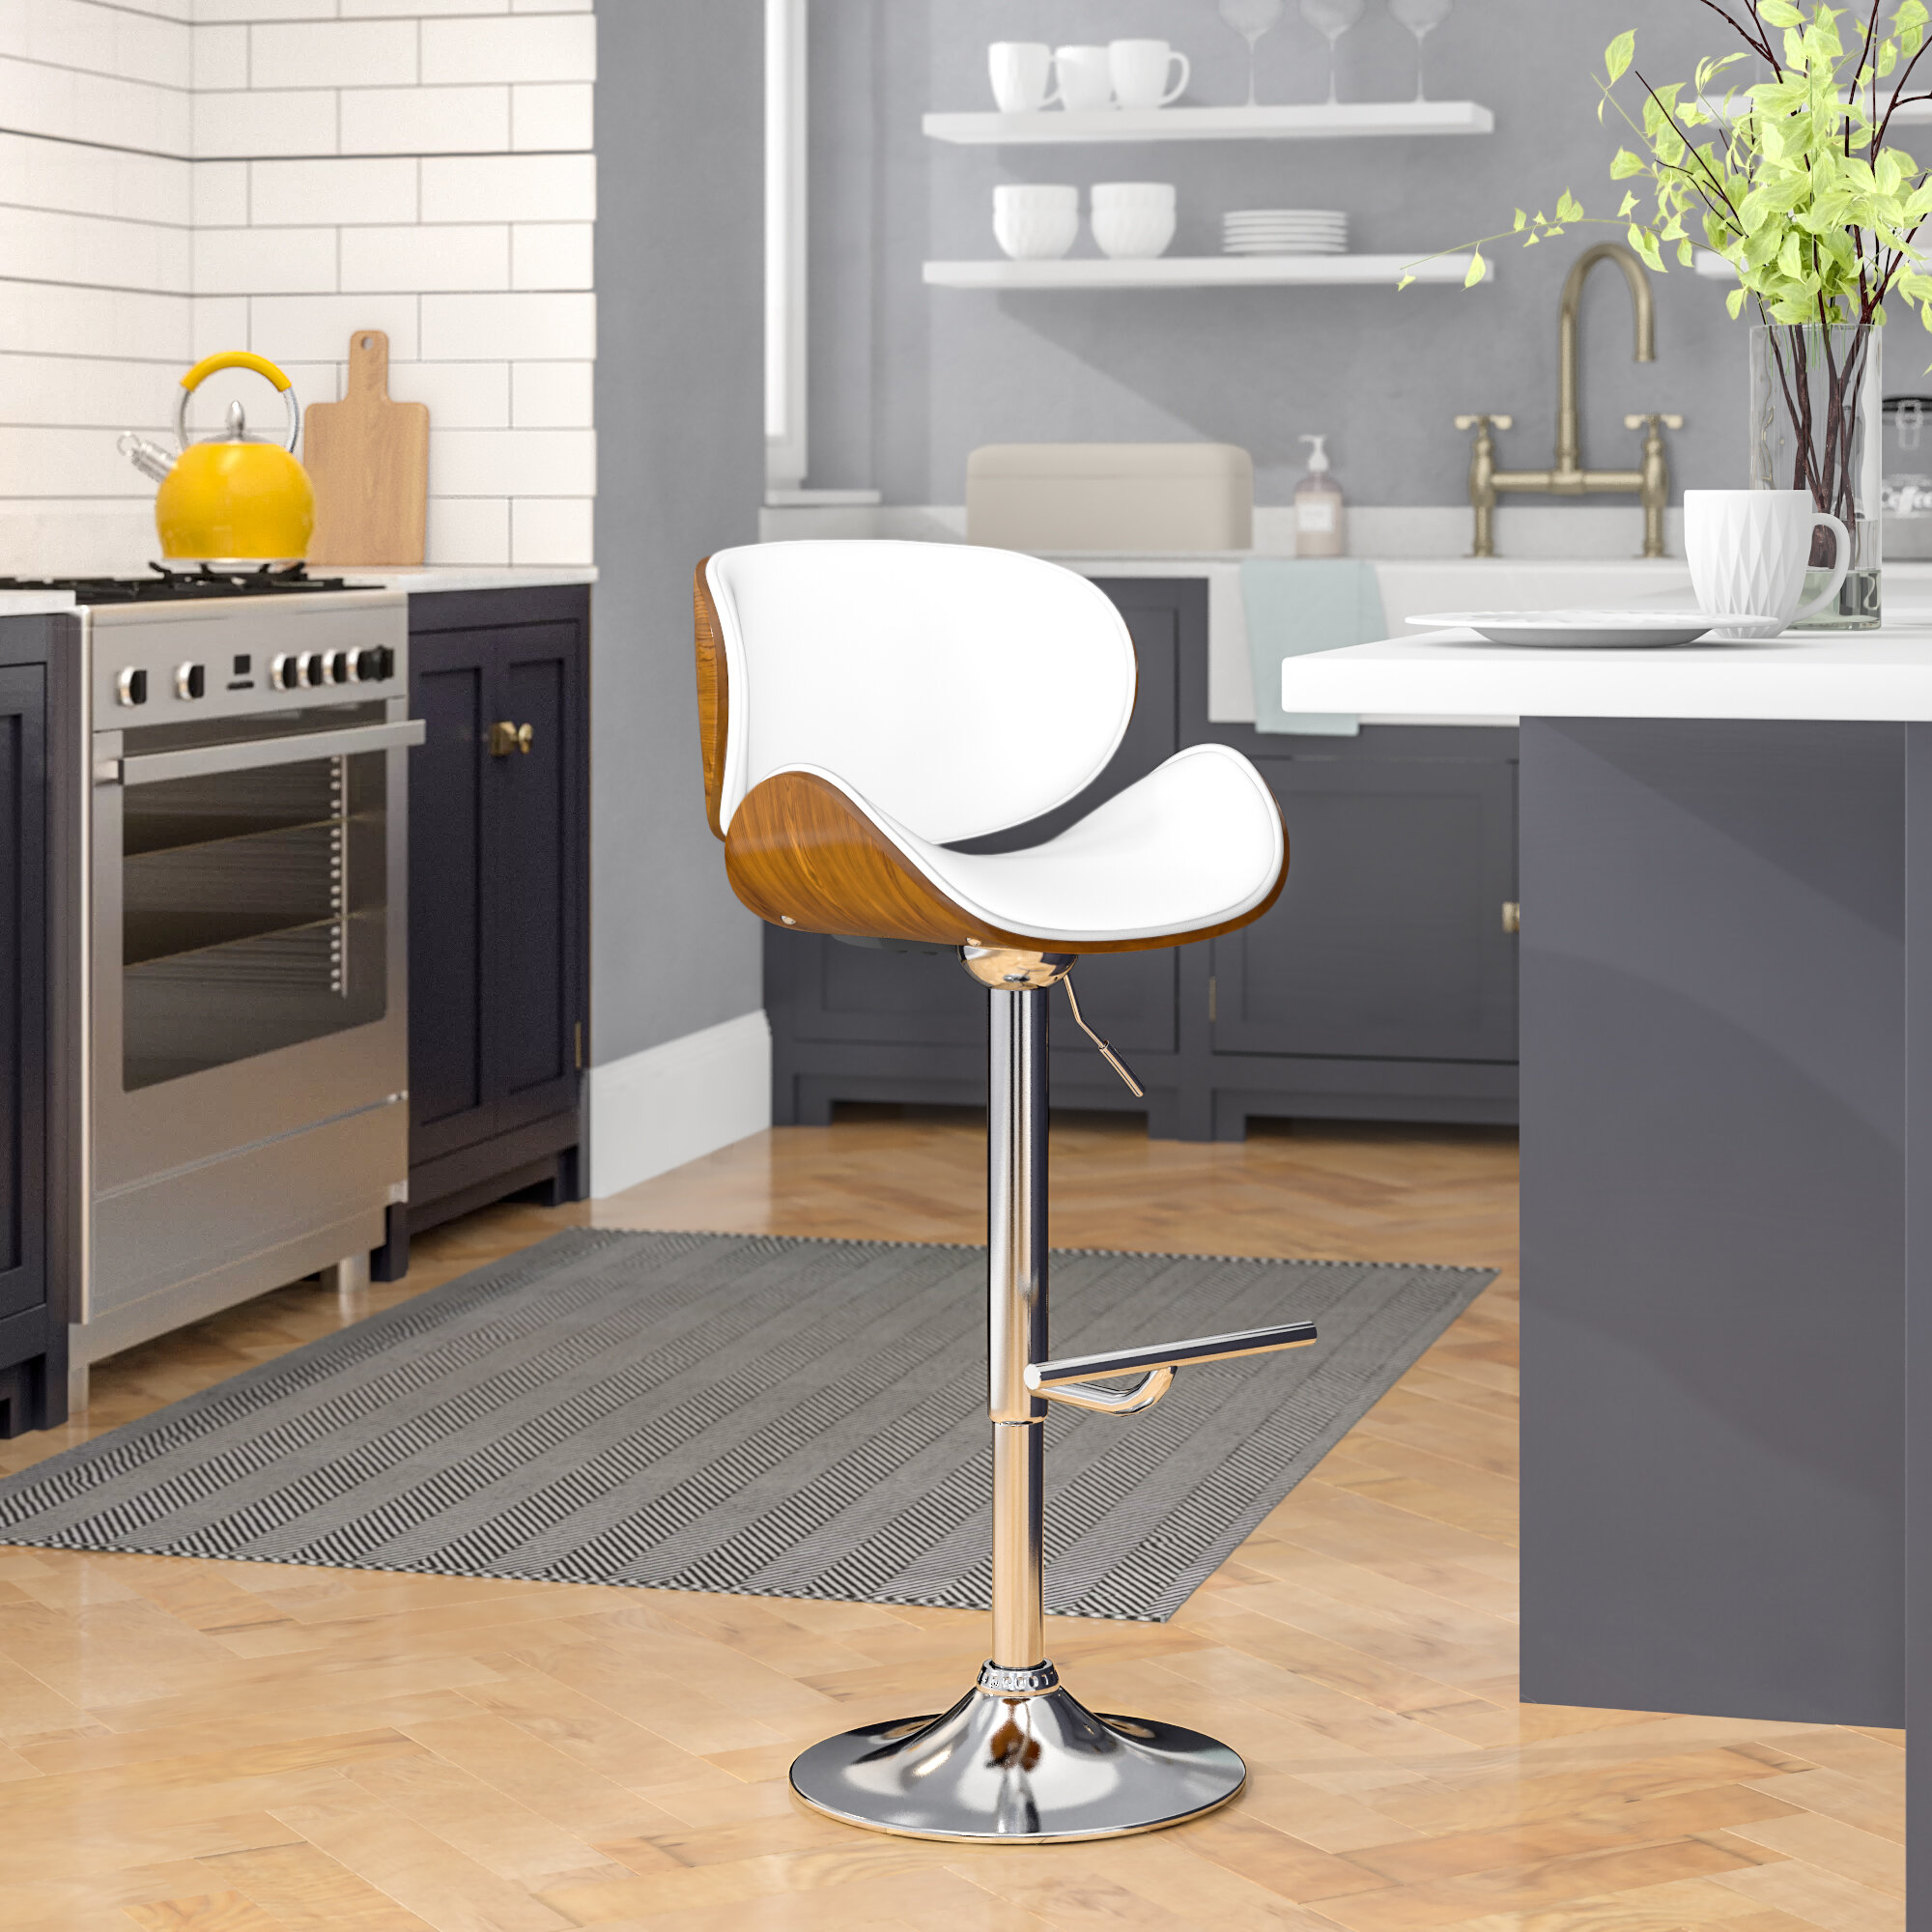 Awe Inspiring George Oliver Bissett Adjustable Height Swivel Bar Stool Beatyapartments Chair Design Images Beatyapartmentscom